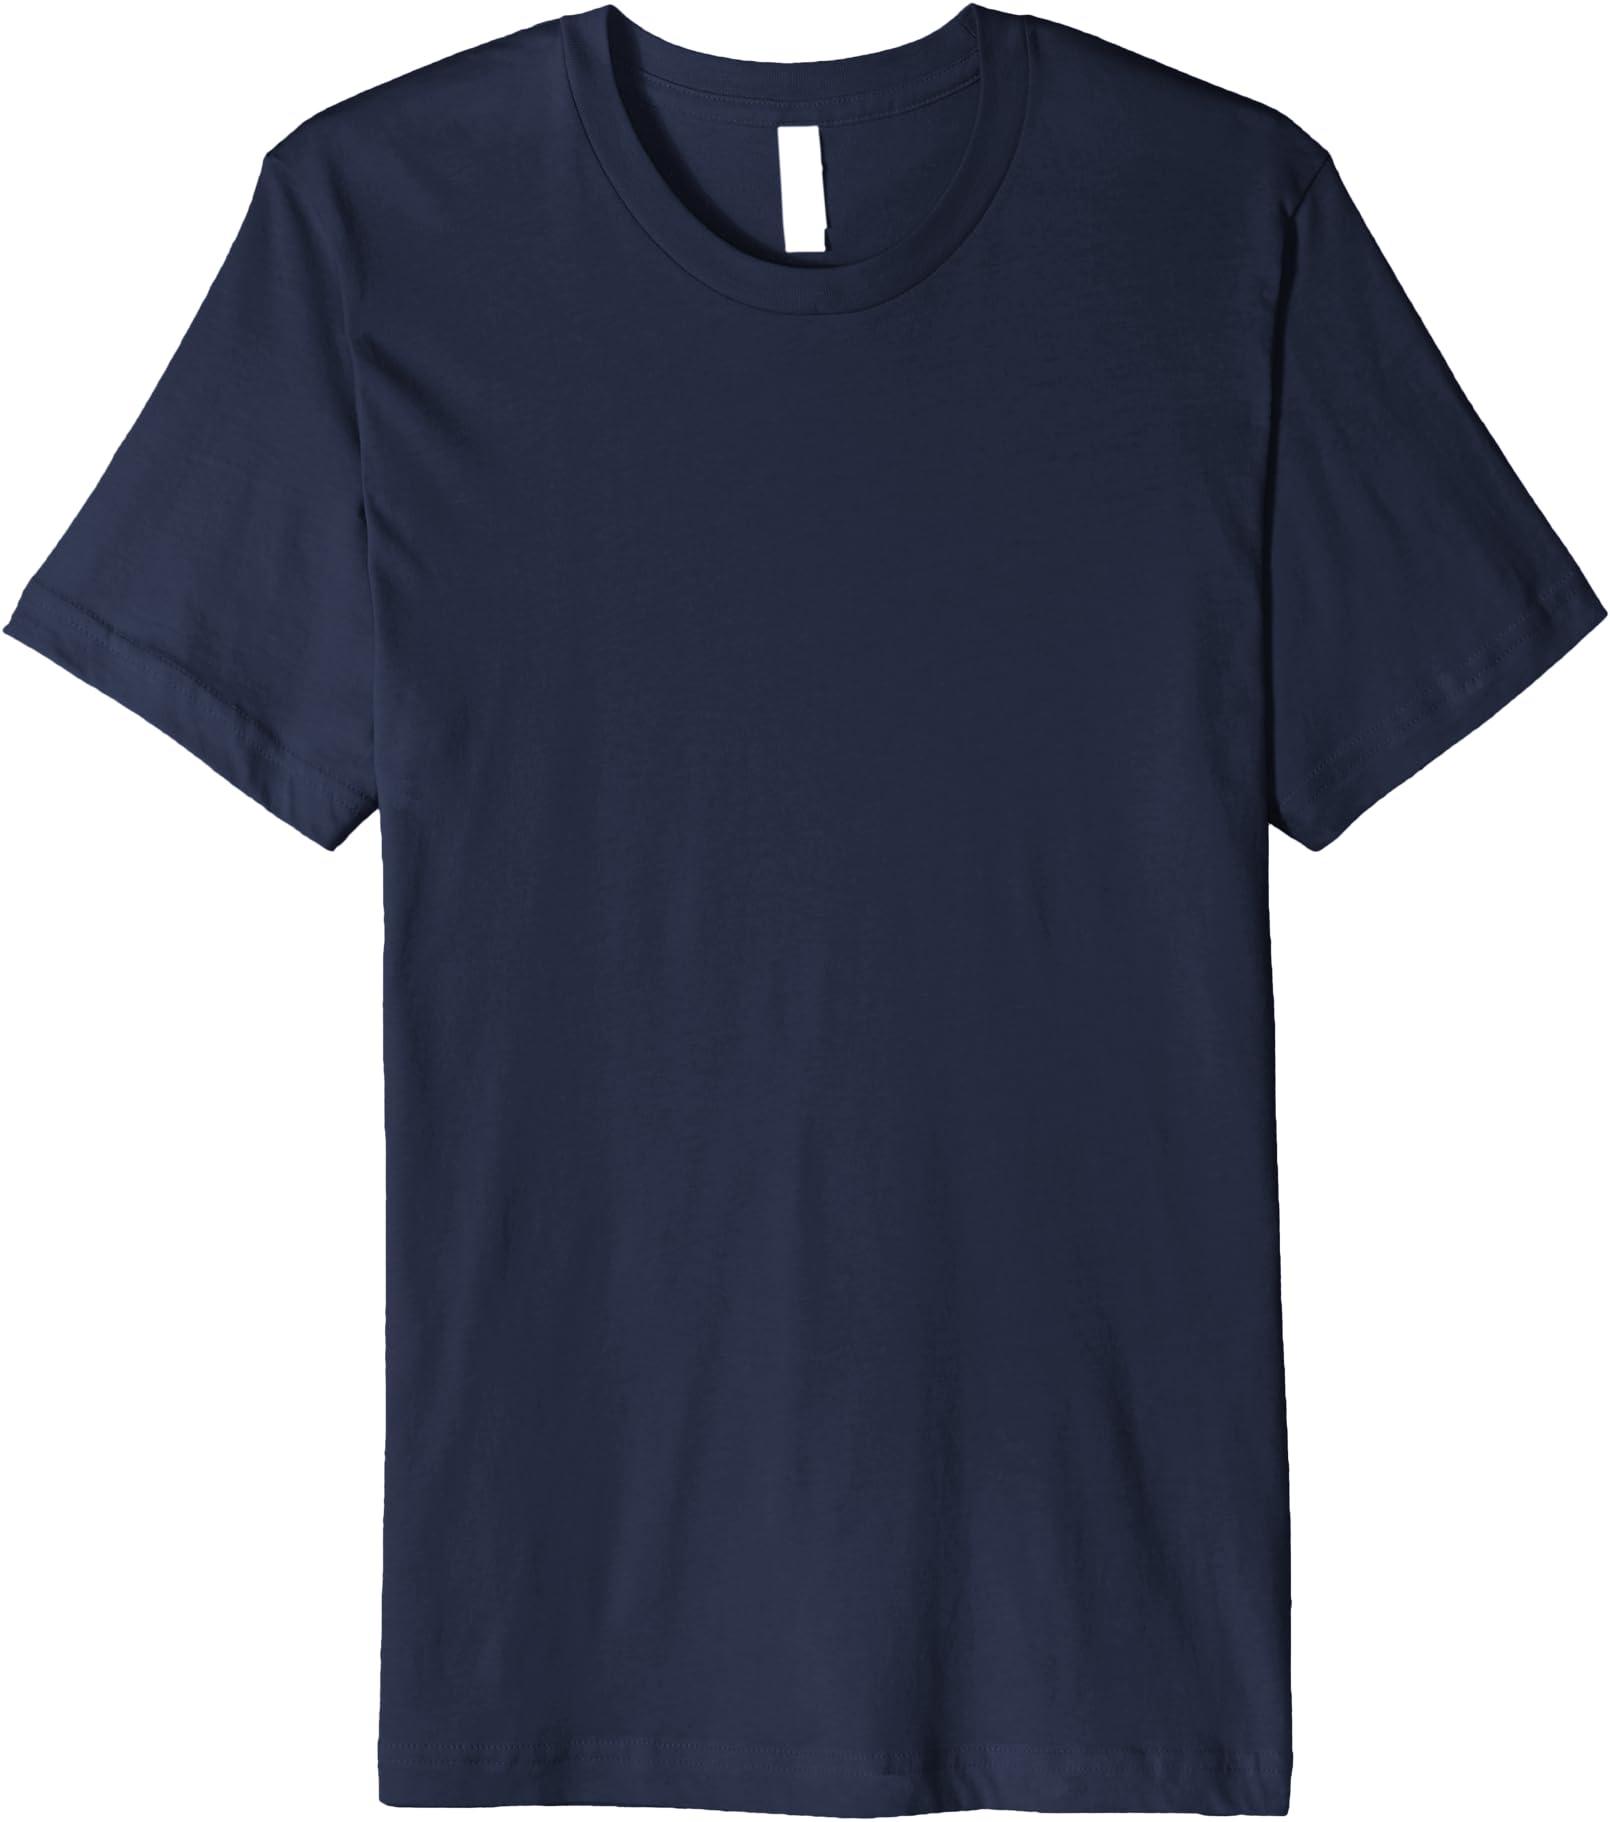 McCain DDG 56 Print US Navy Mens Classic Polo Shirt USS John S